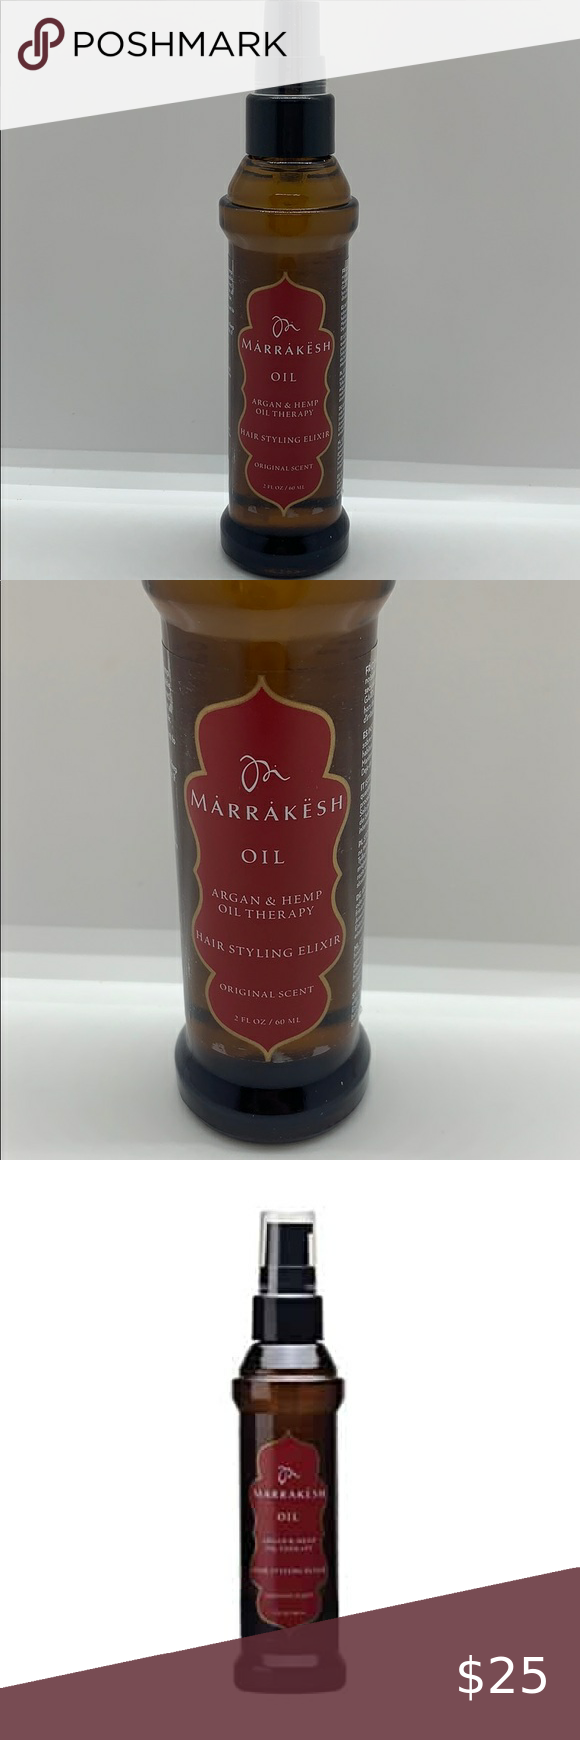 Nwt Marrakesh Oil Hair Styling Elixir In 2020 Hair Oil Oils Hair Styles